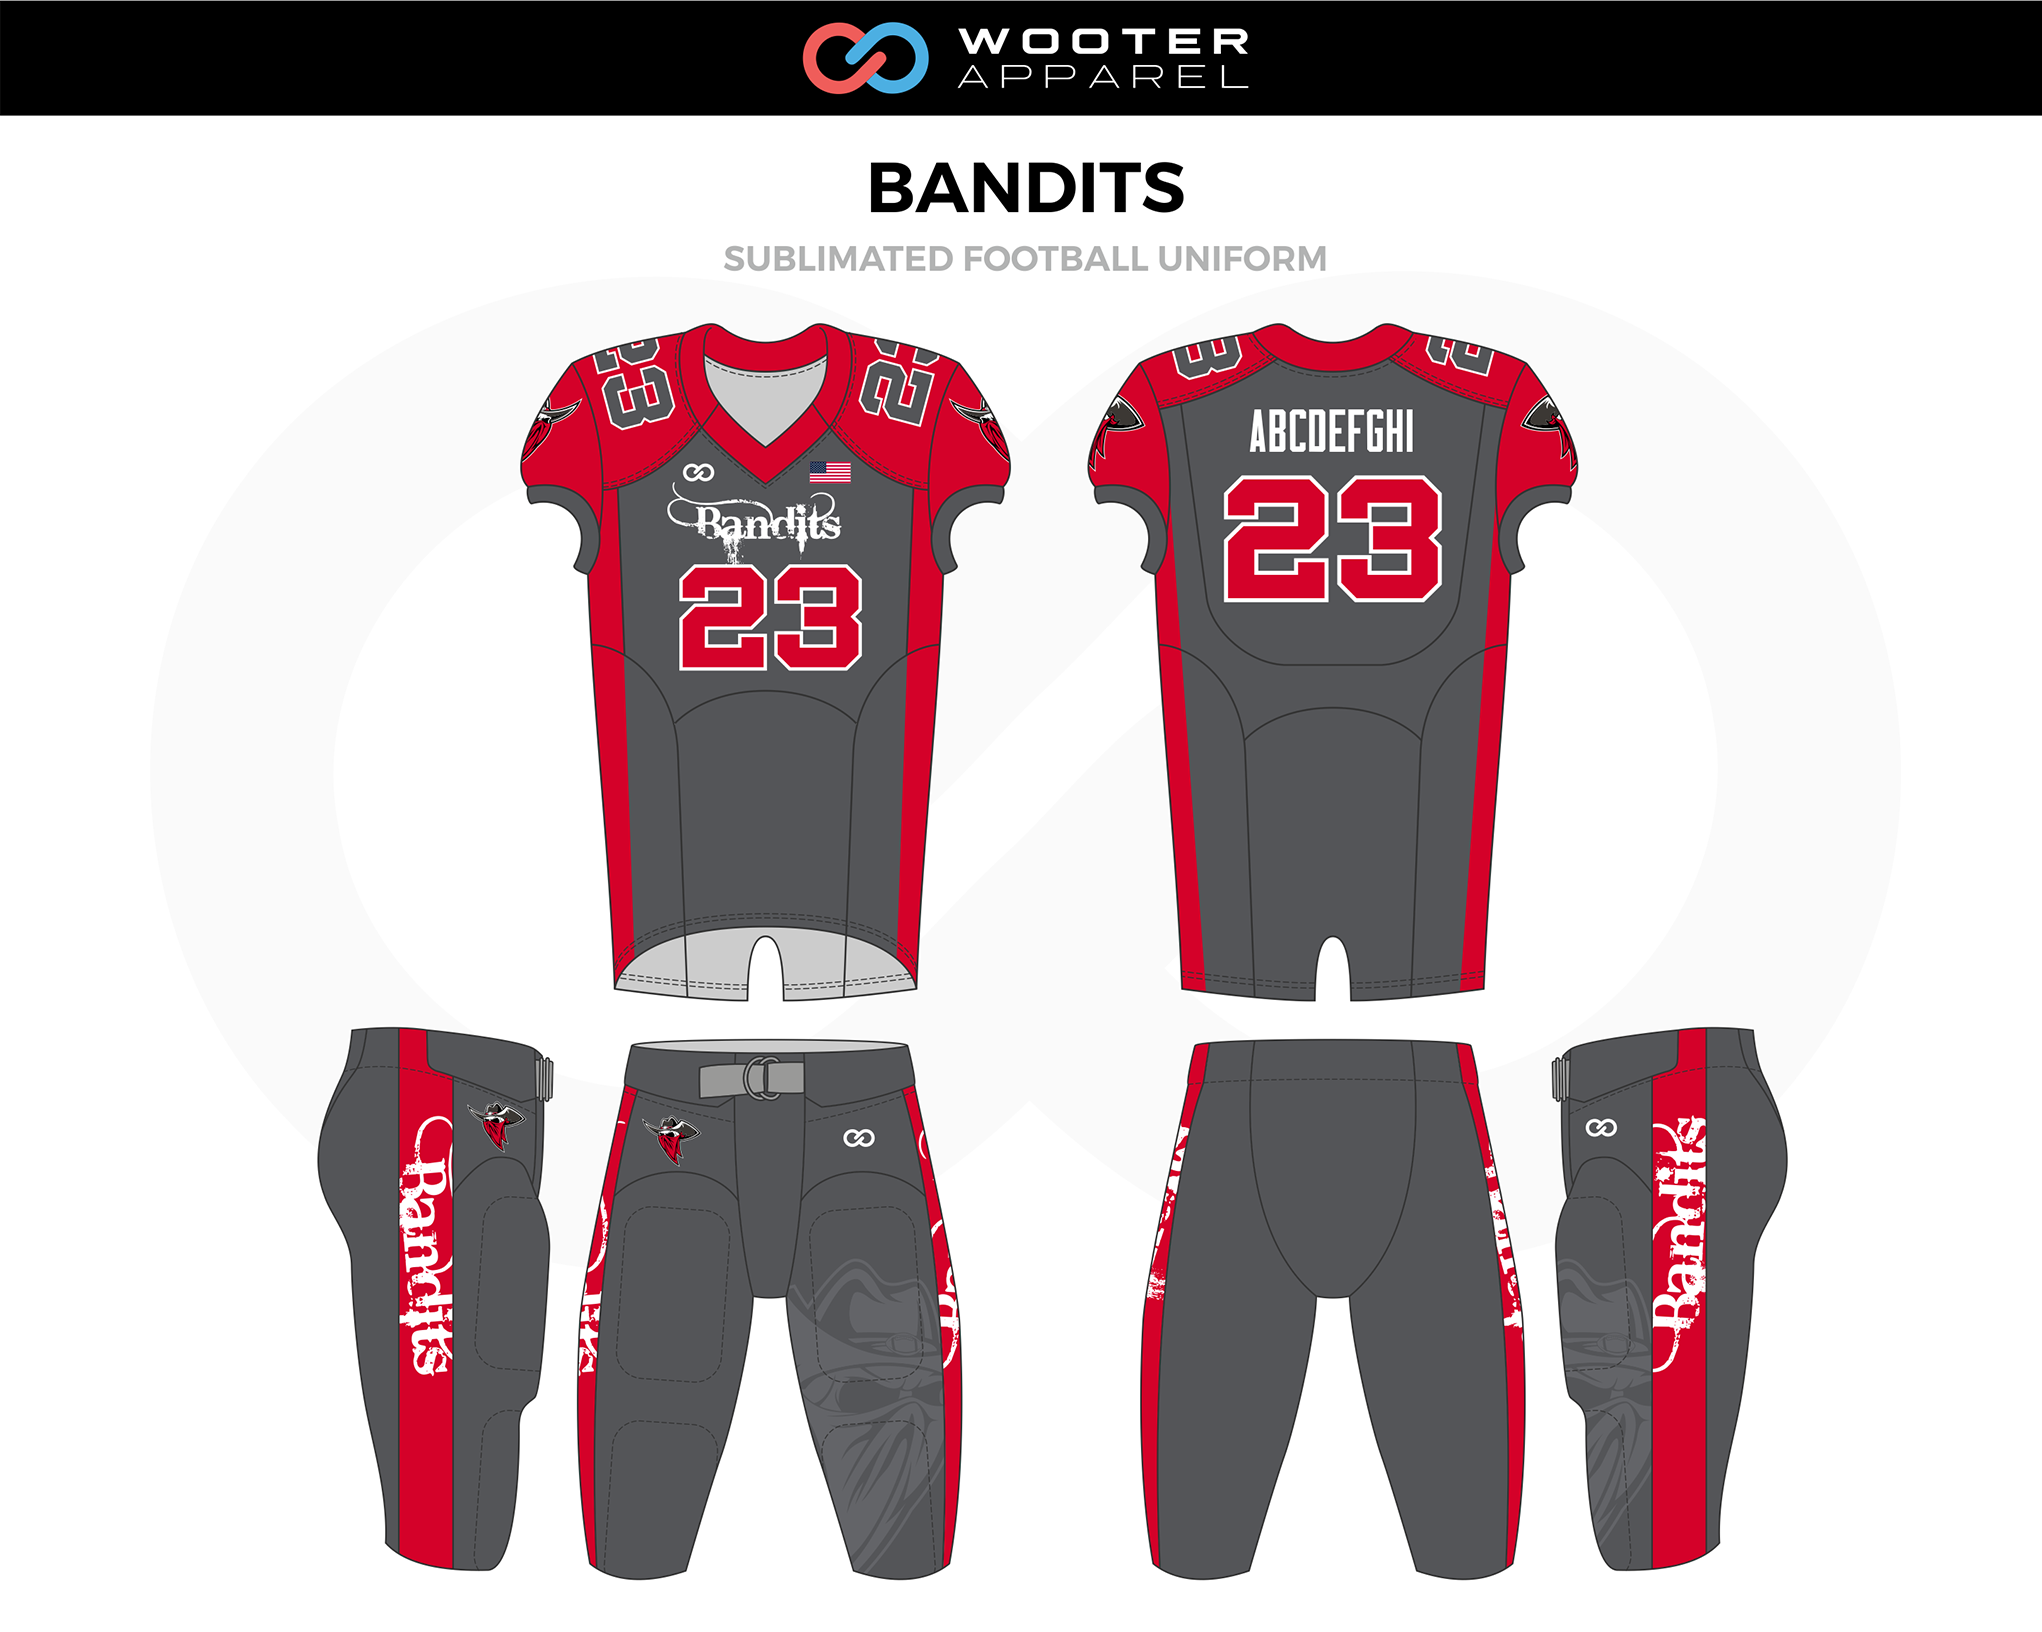 BANDITS Red Gray White Football Uniform, Jerseys, and Pants